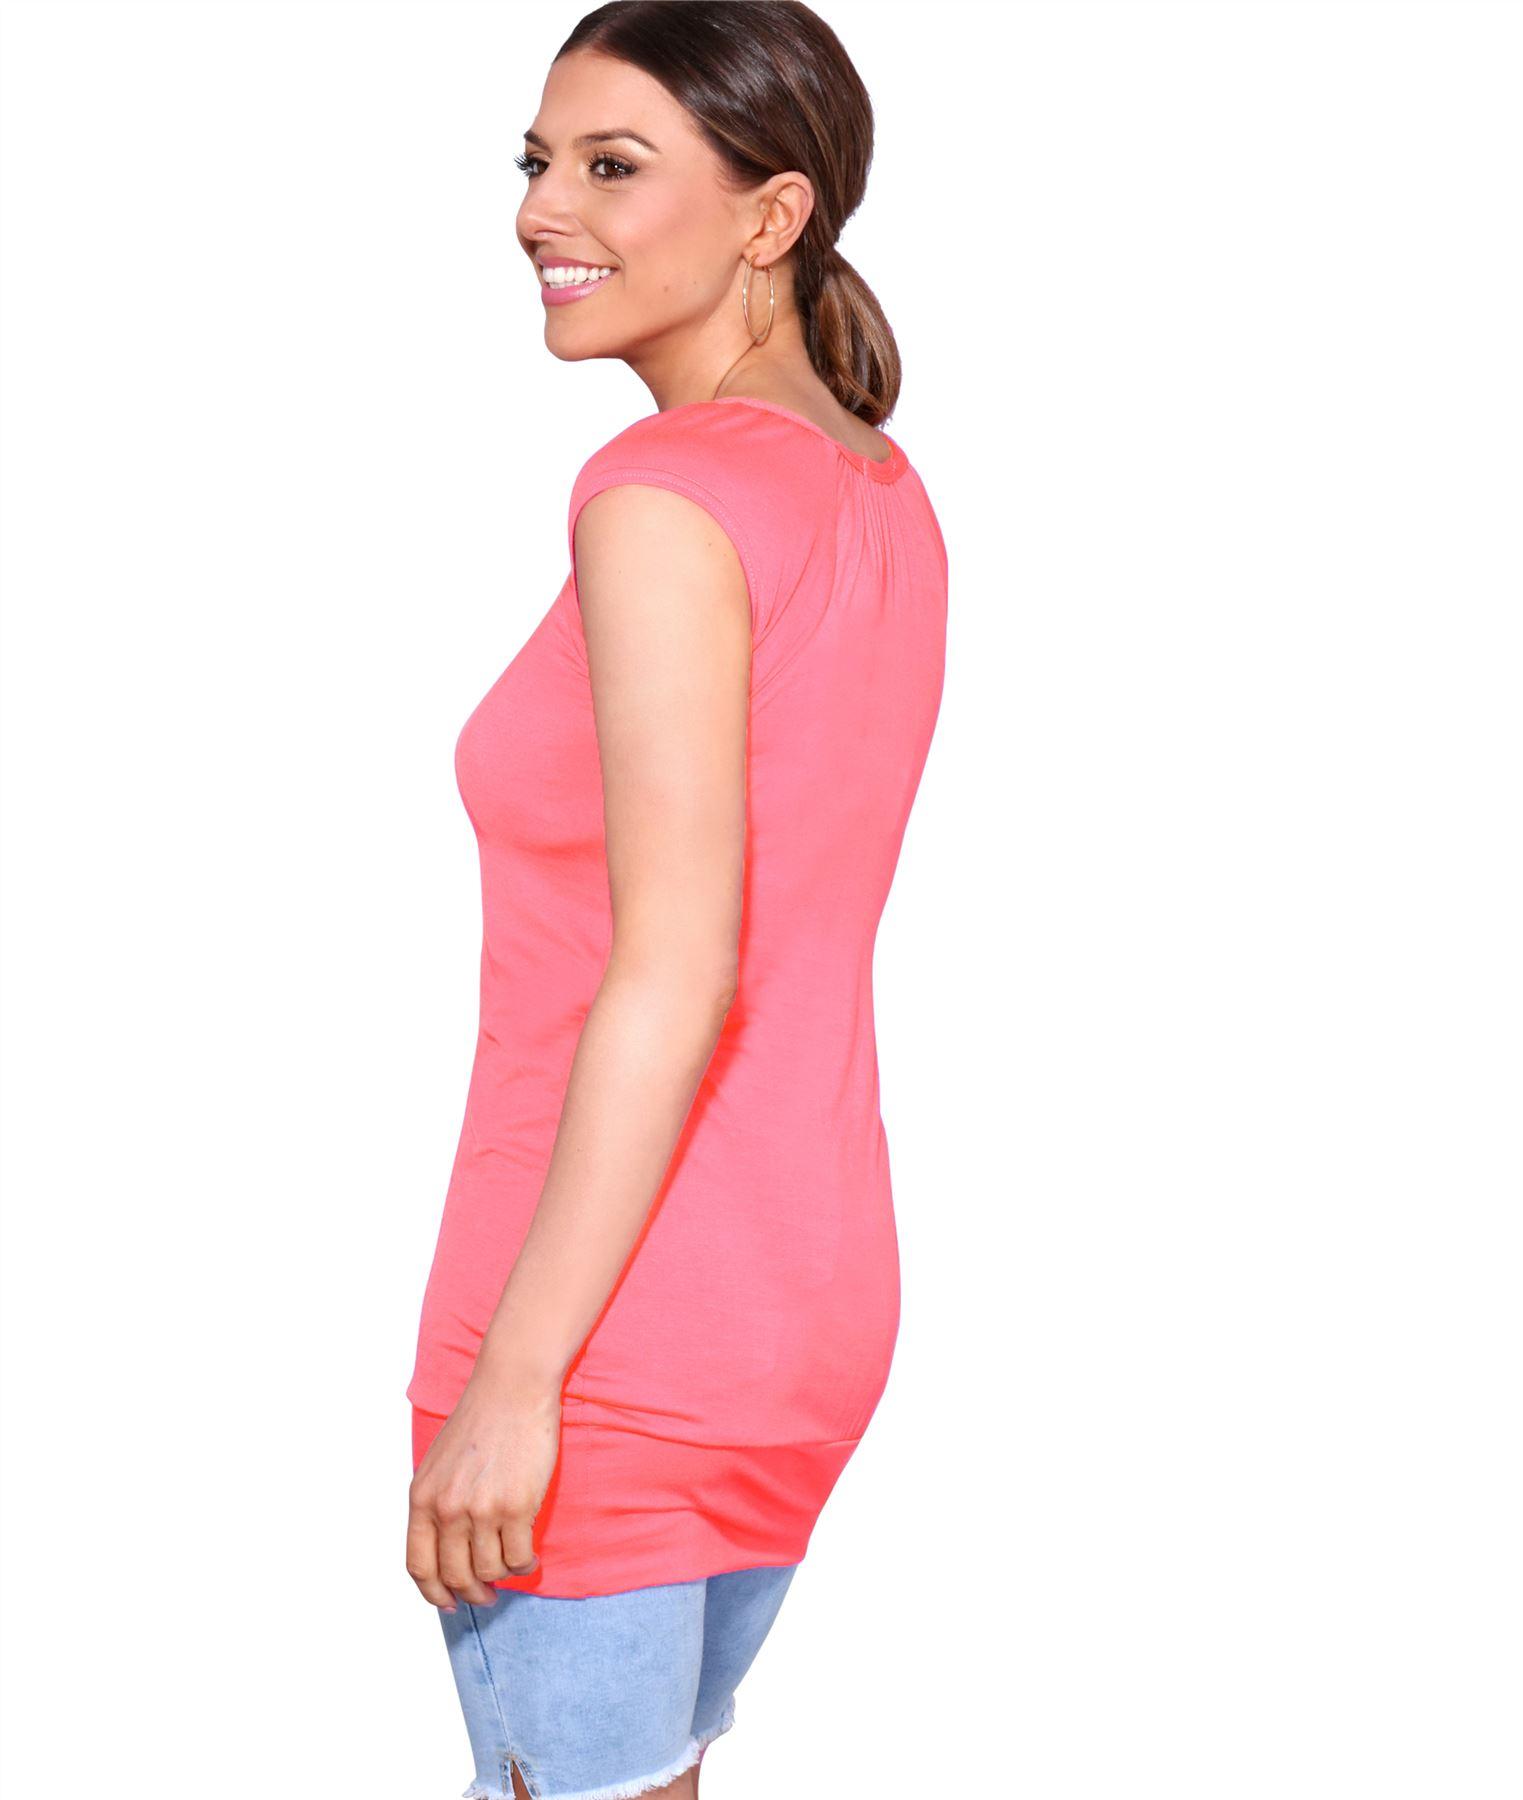 Womens-Ladies-Plain-T-Shirt-Short-Sleeve-Long-Loose-V-Neck-Blouse-Tunic-Top thumbnail 18